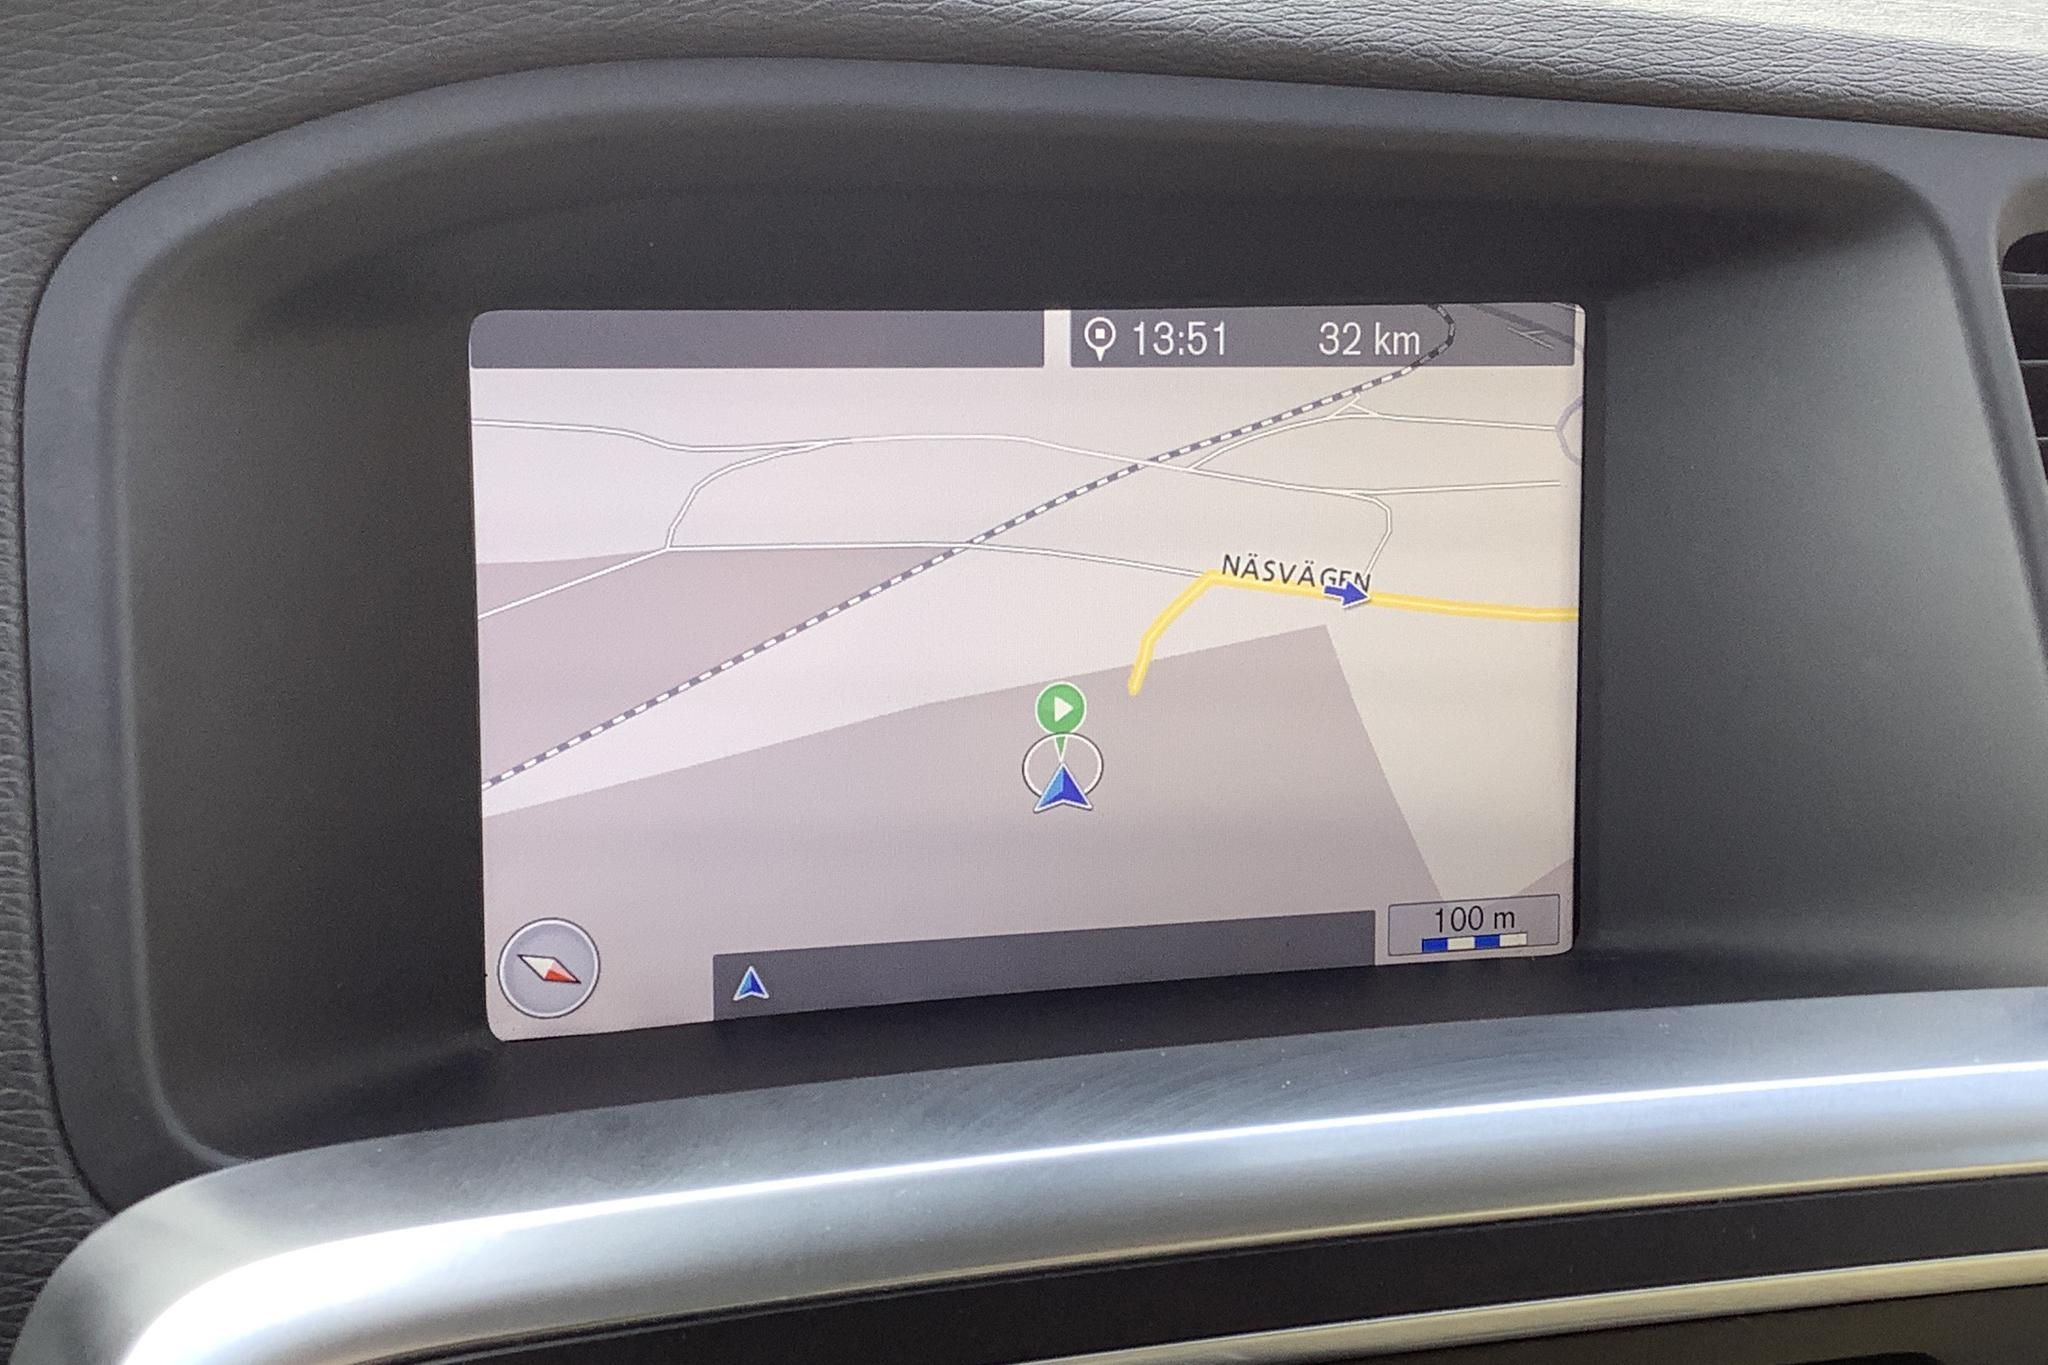 Volvo V60 D3 (163hk) - 128 170 km - Automatic - black - 2012